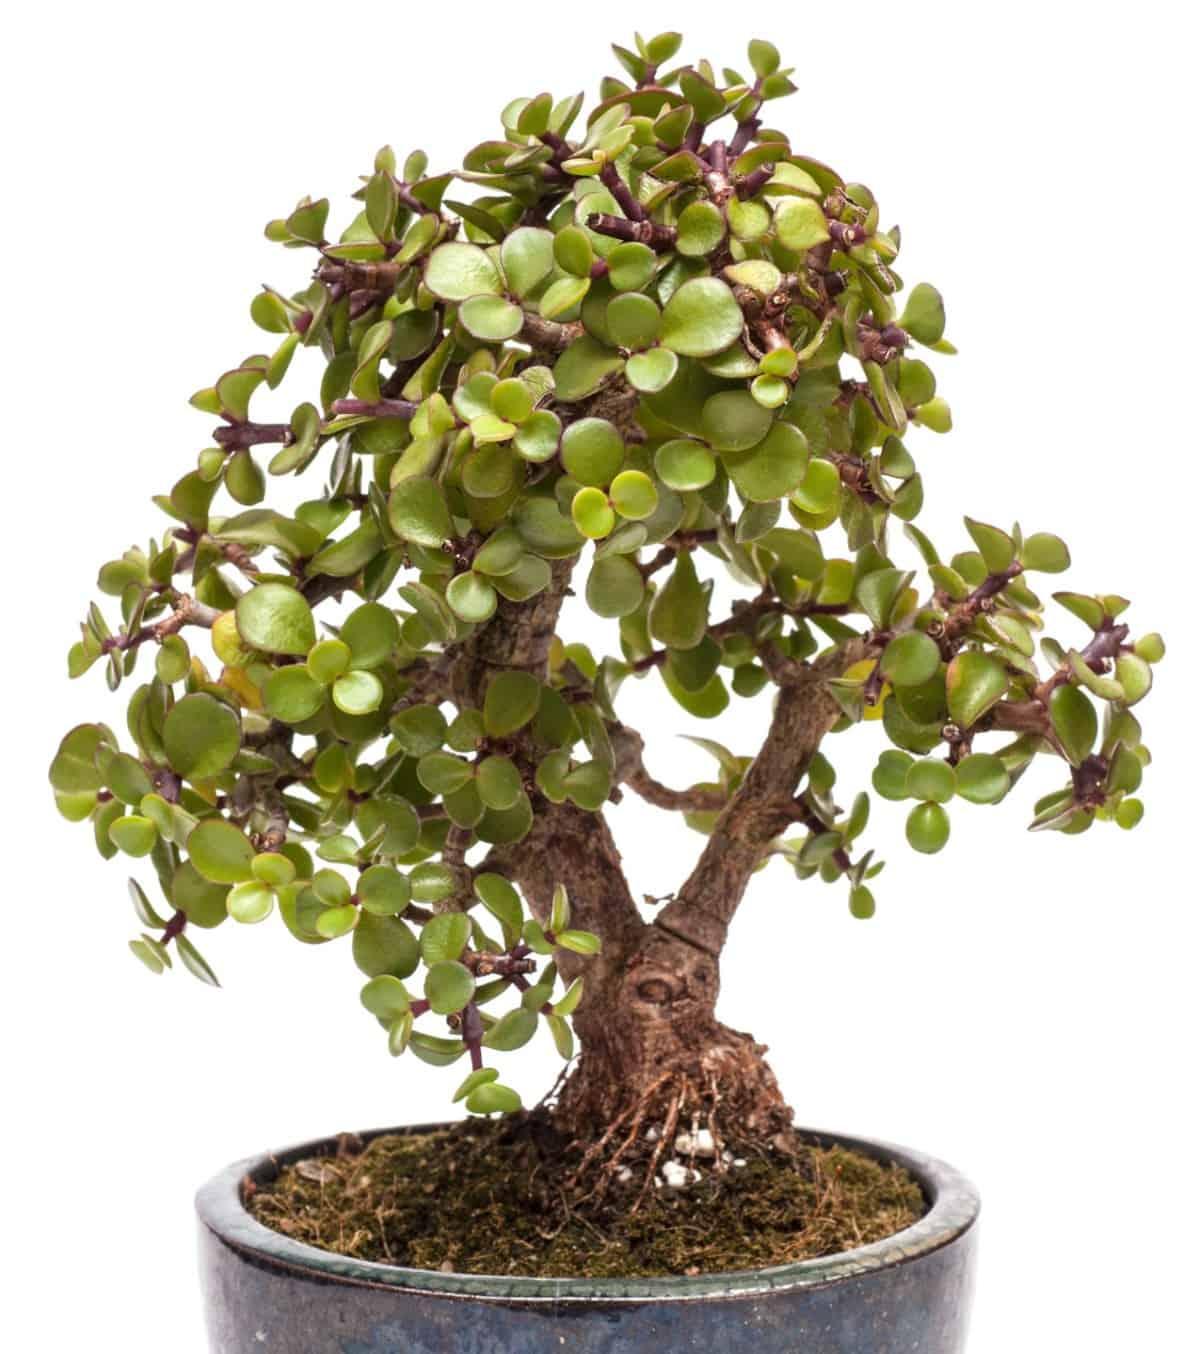 The dwarf jade is a succulent bonsai tree.